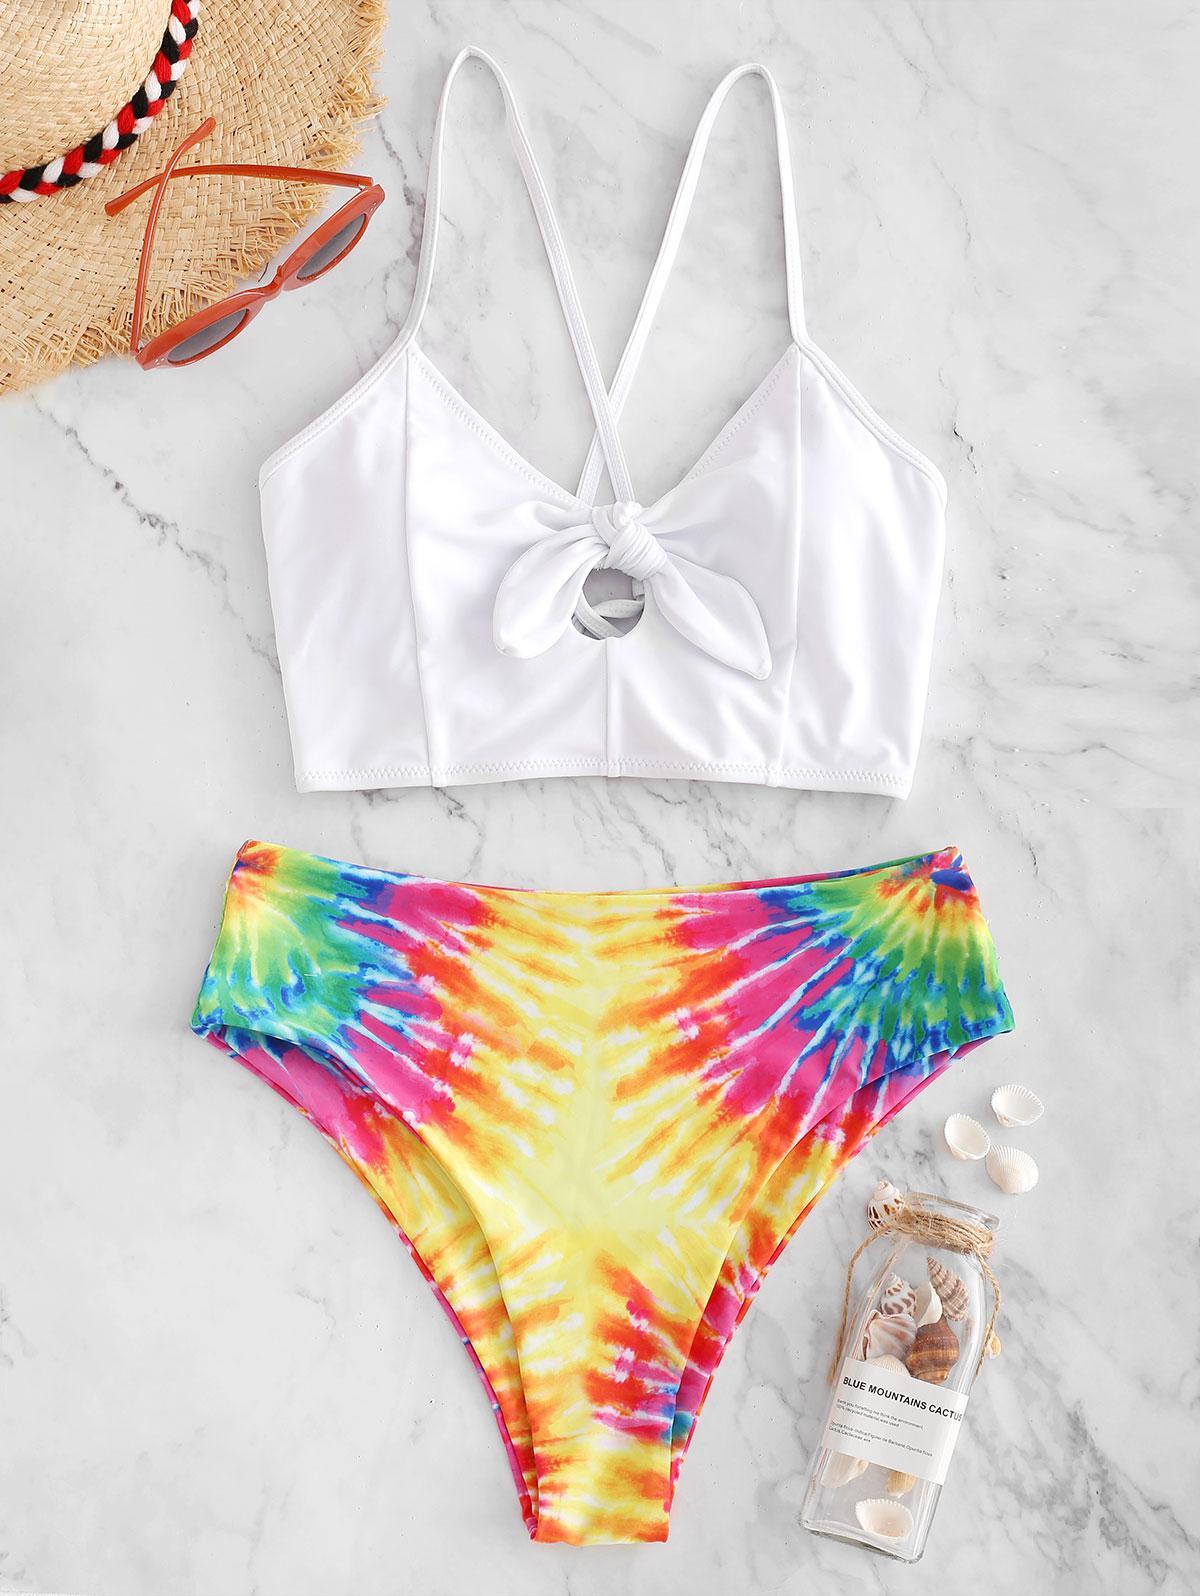 ZAFUL Knot Crisscross Rainbow Tie Dye Tankini Swimsuit, Multi-a